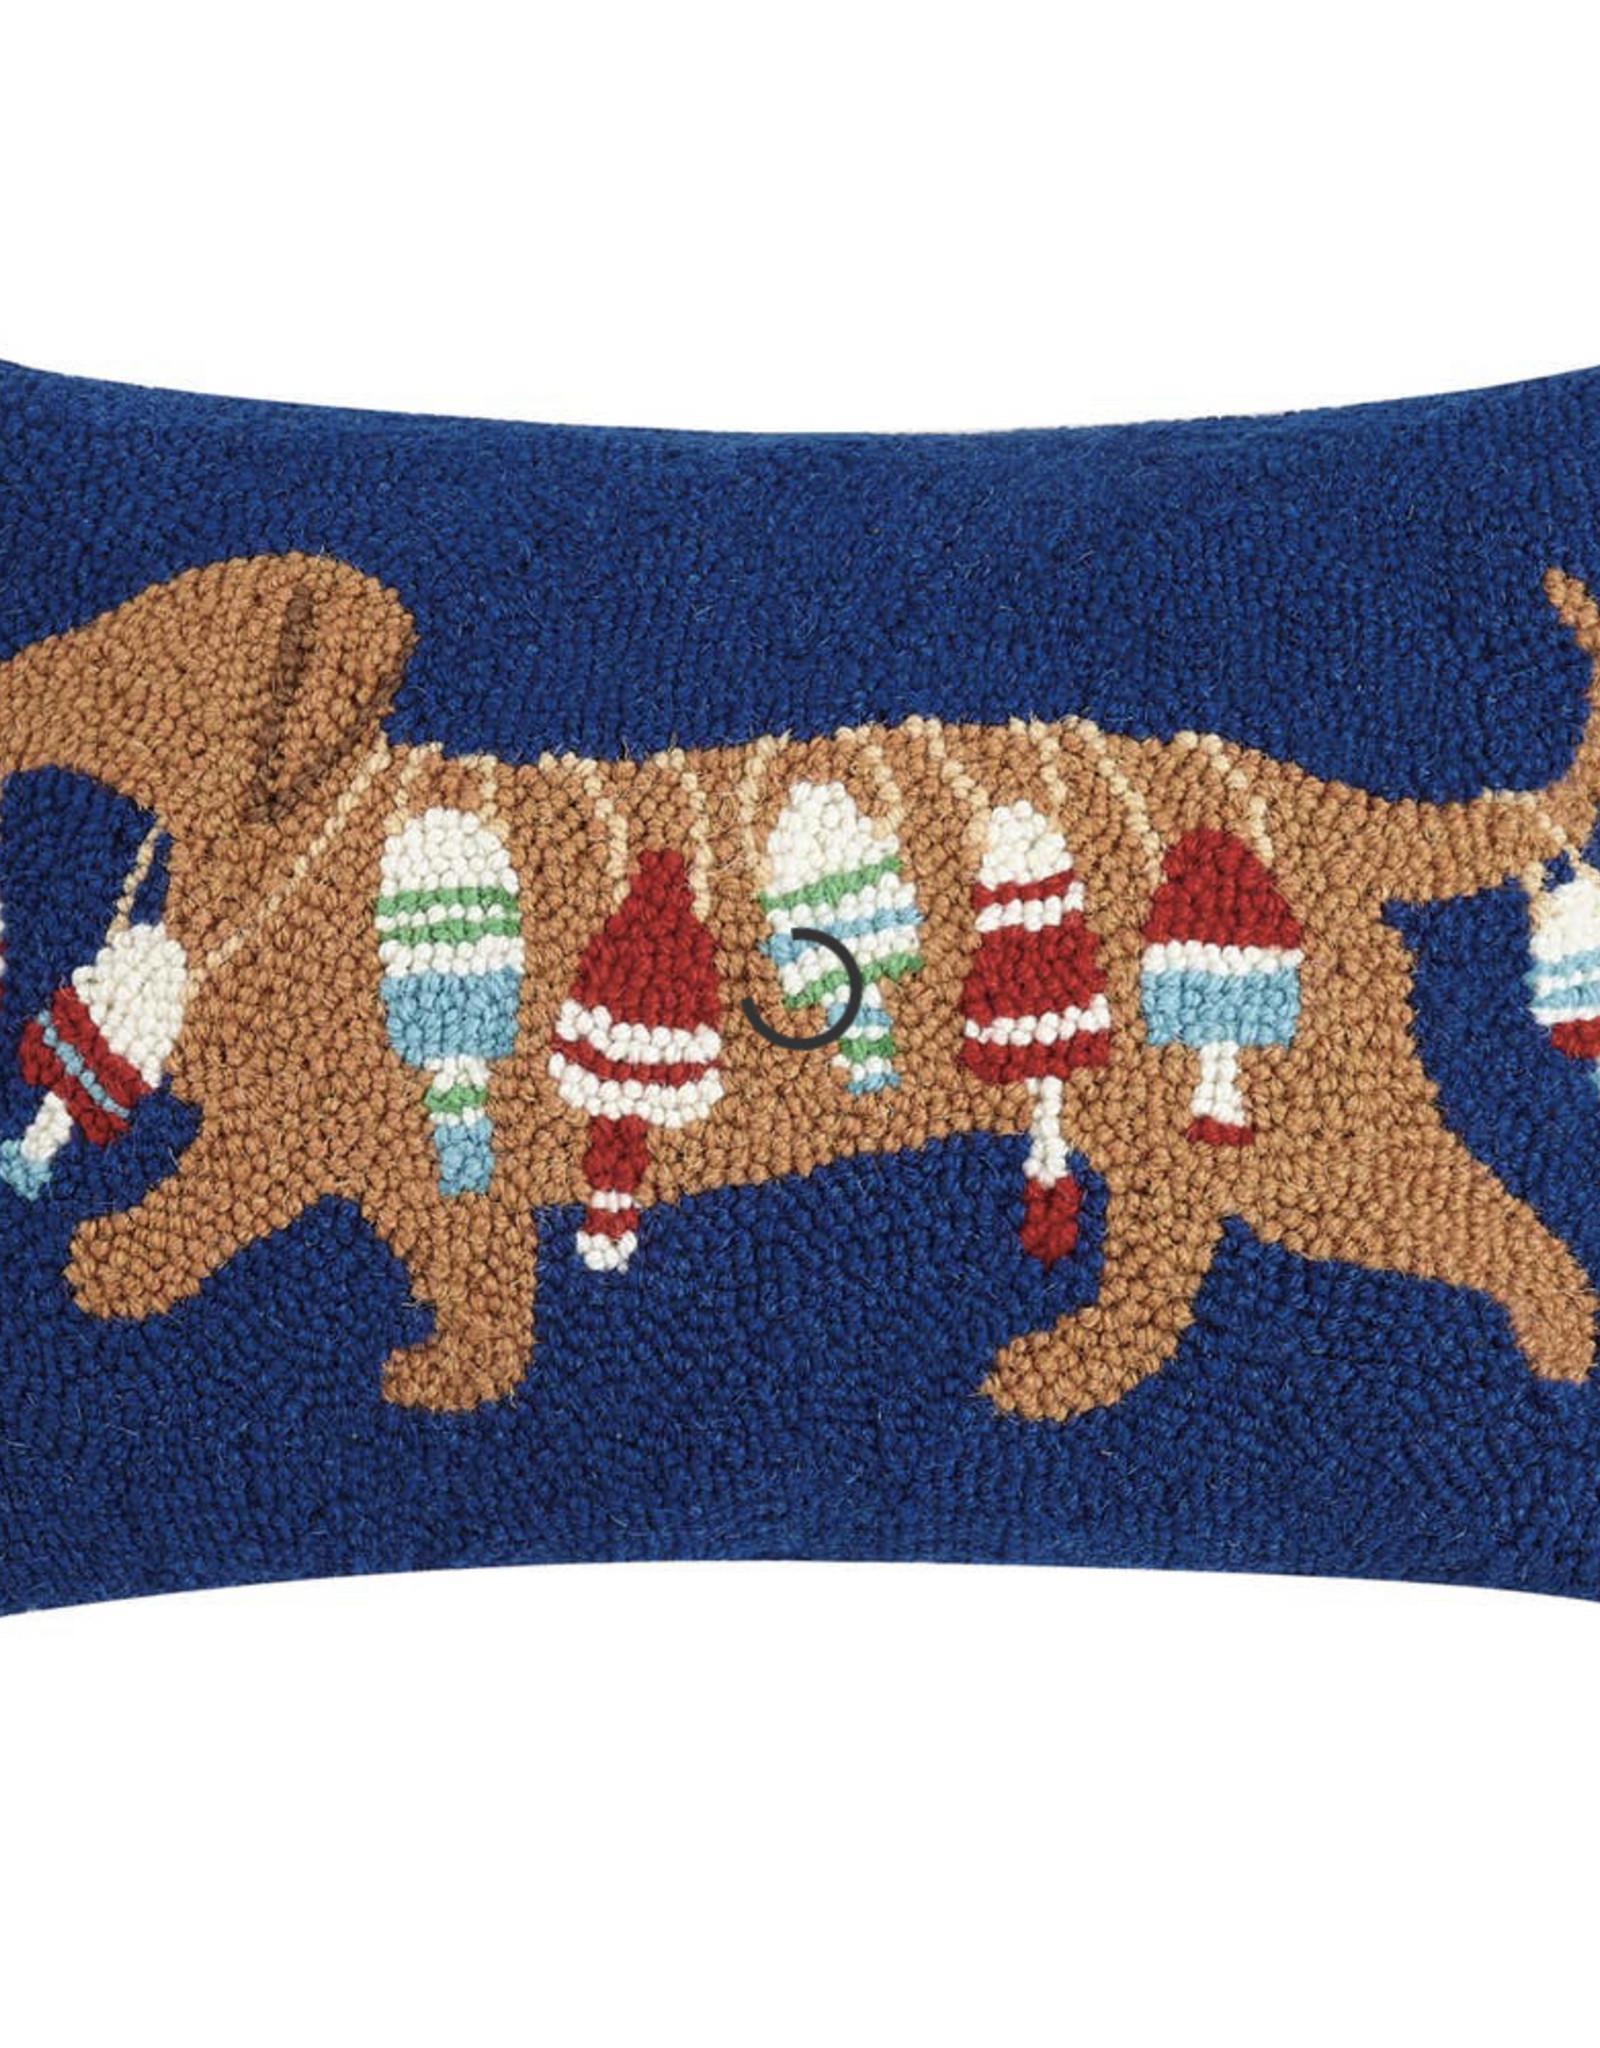 Peking Handicraft Dachshund Dog With Buoy Hook Pillow